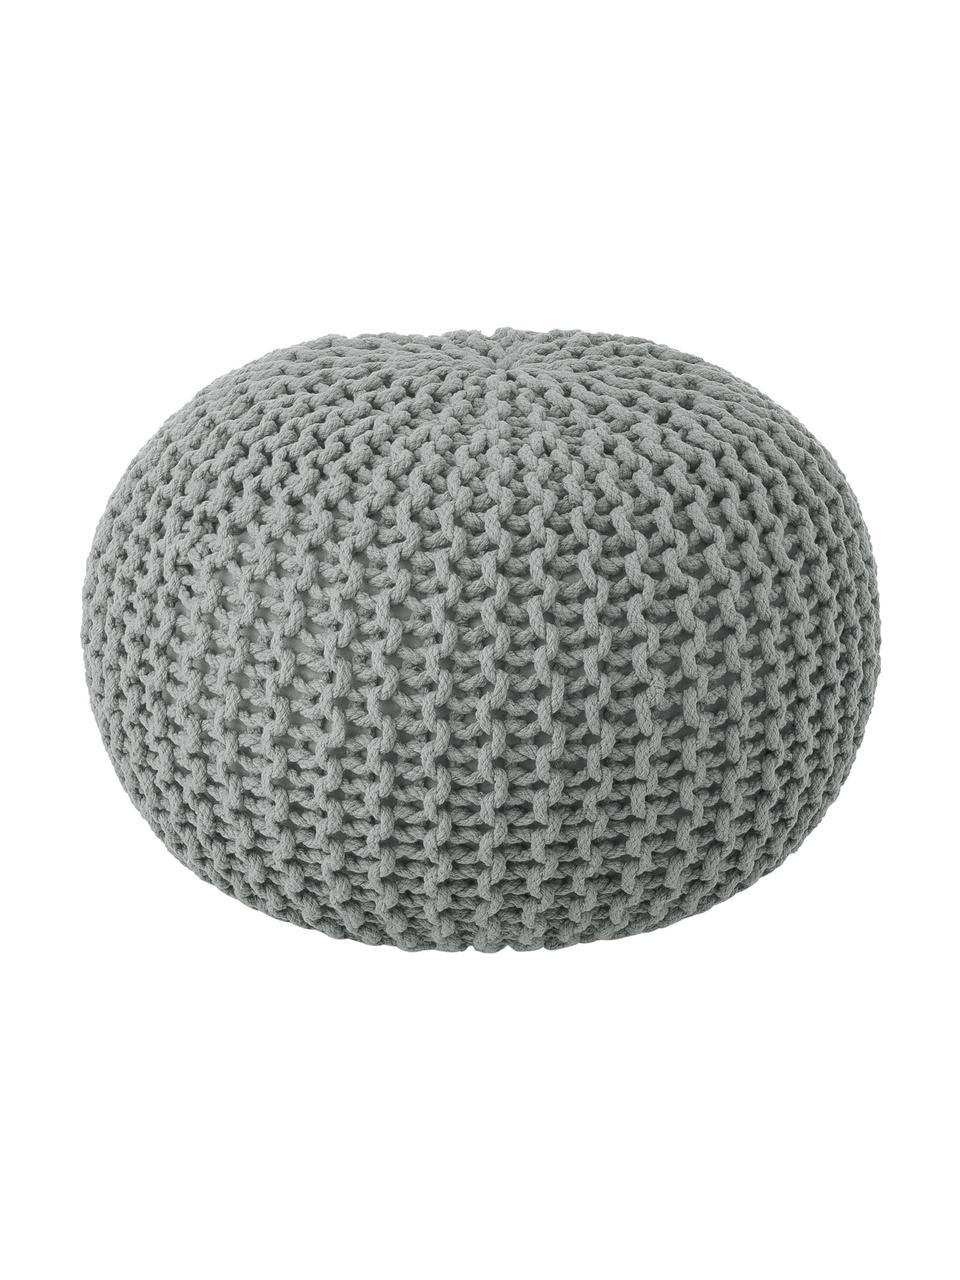 Handgefertigter Strickpouf Dori, Bezug: 100% Baumwolle, Hellgrau, Ø 55 x H 35 cm